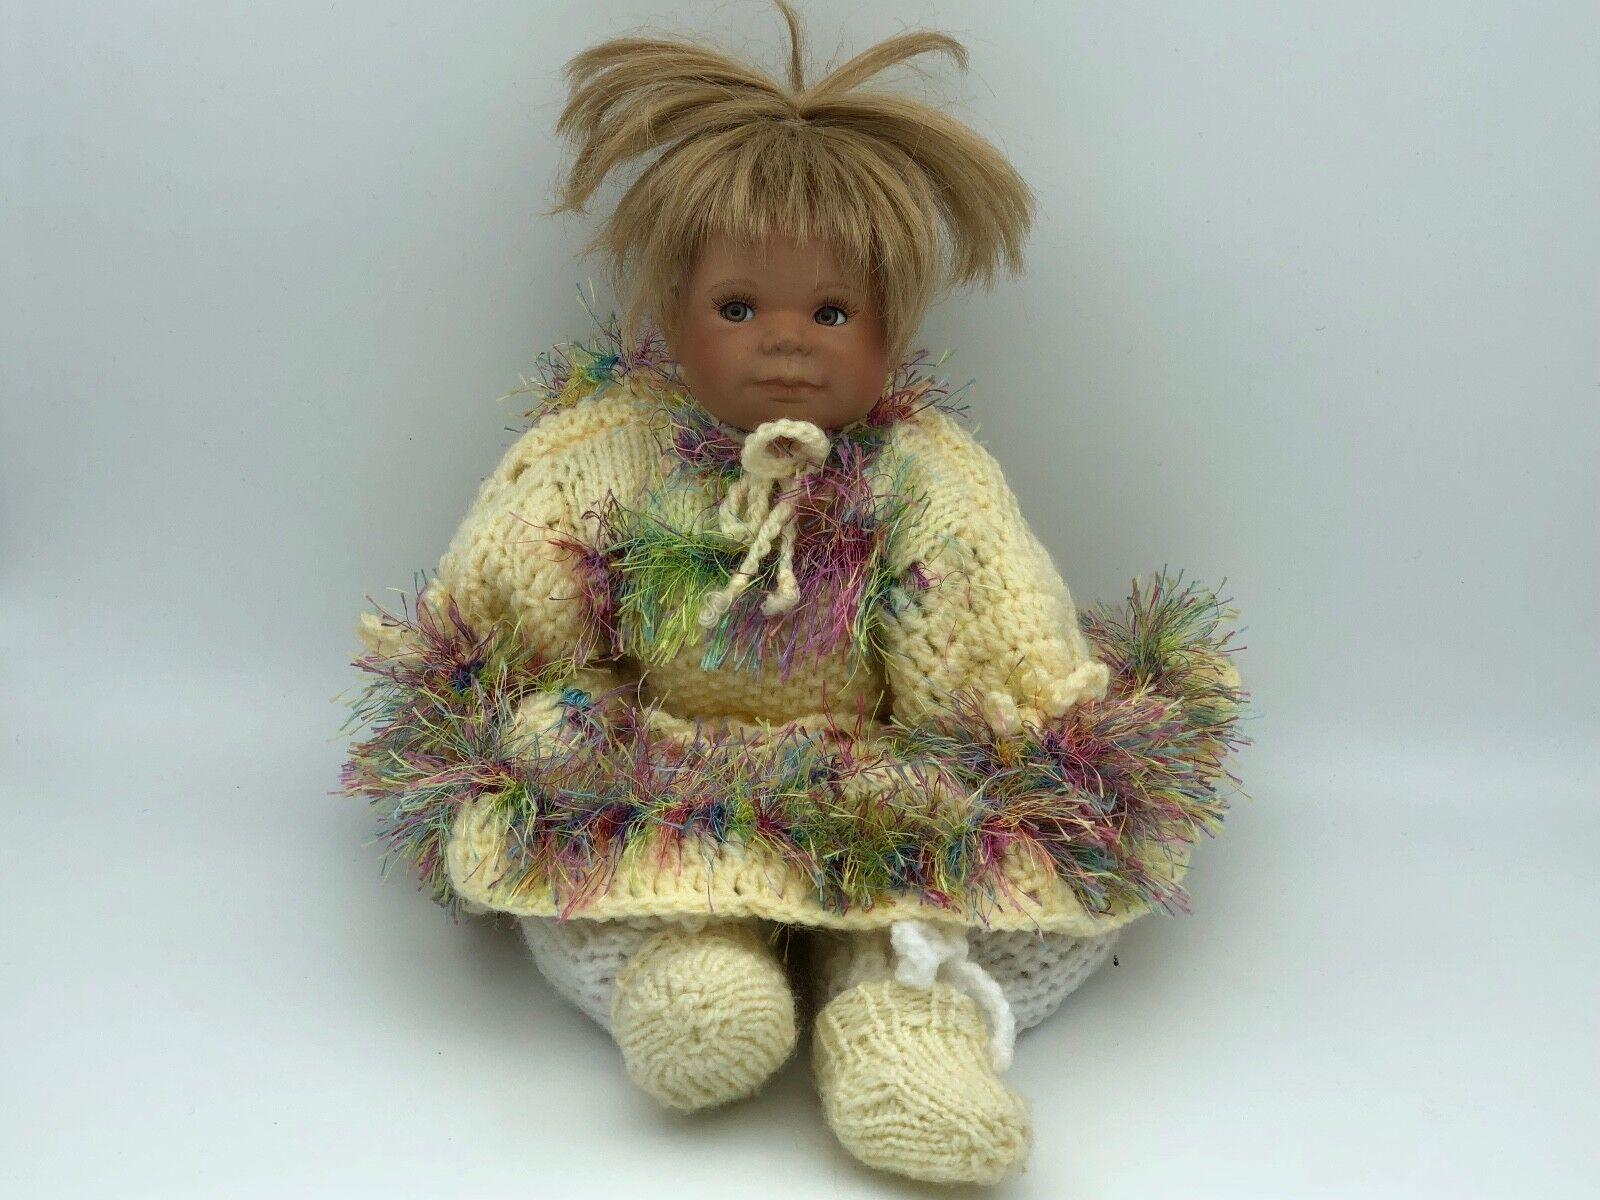 Künstlerpuppe Porzellan Puppe 33 cm. Top Zustand